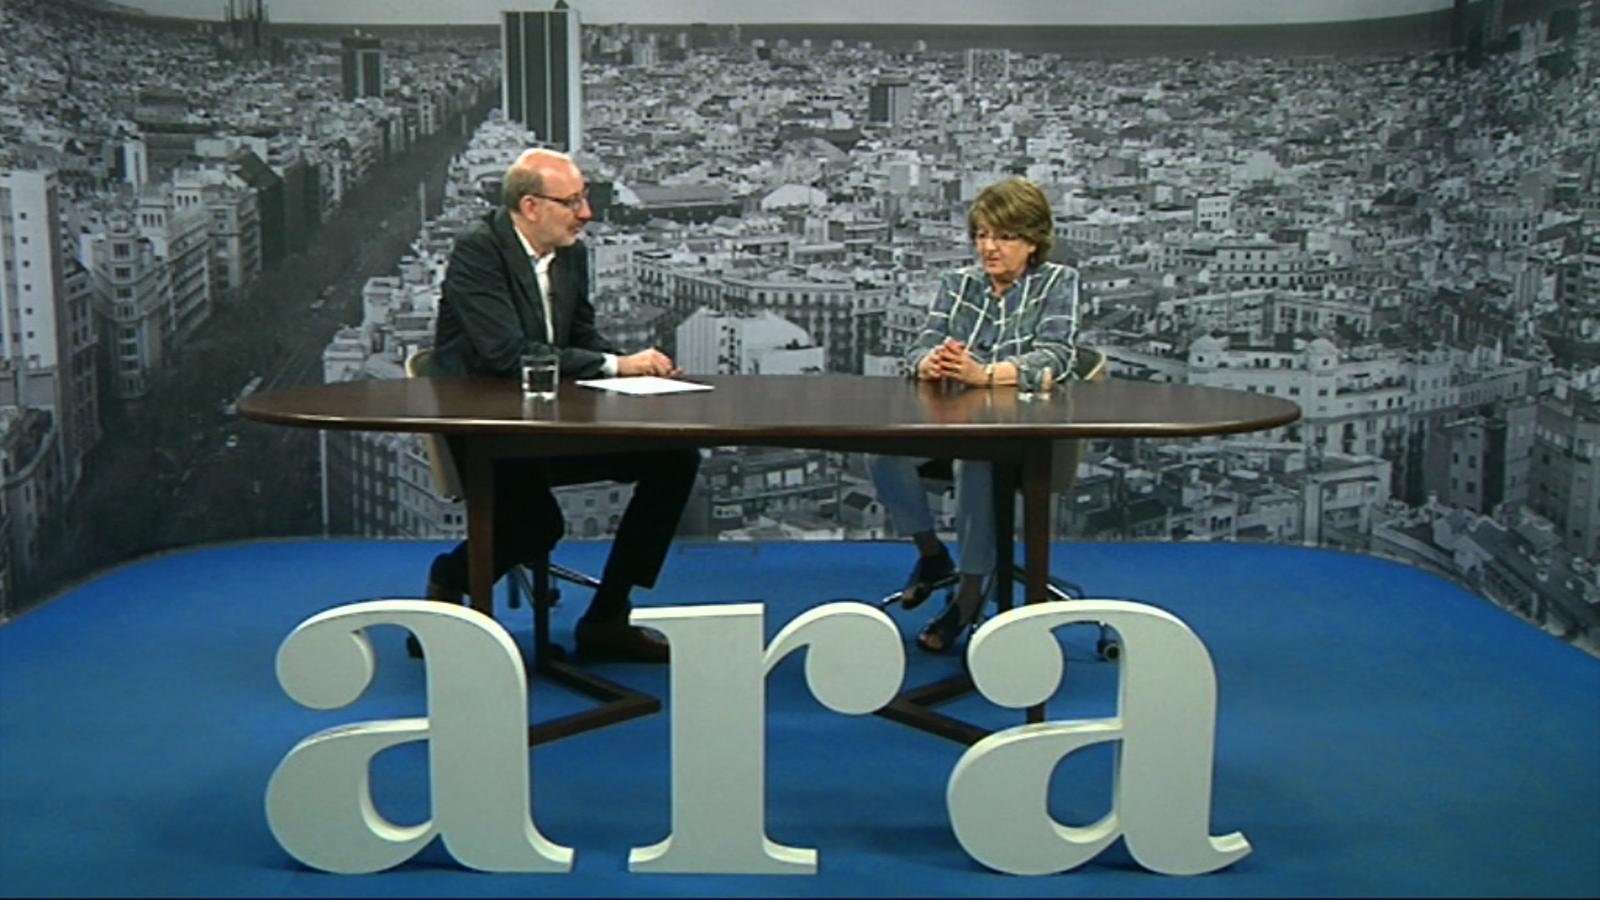 Entrevista d'Antoni Bassas a Marta Sanz-Solé